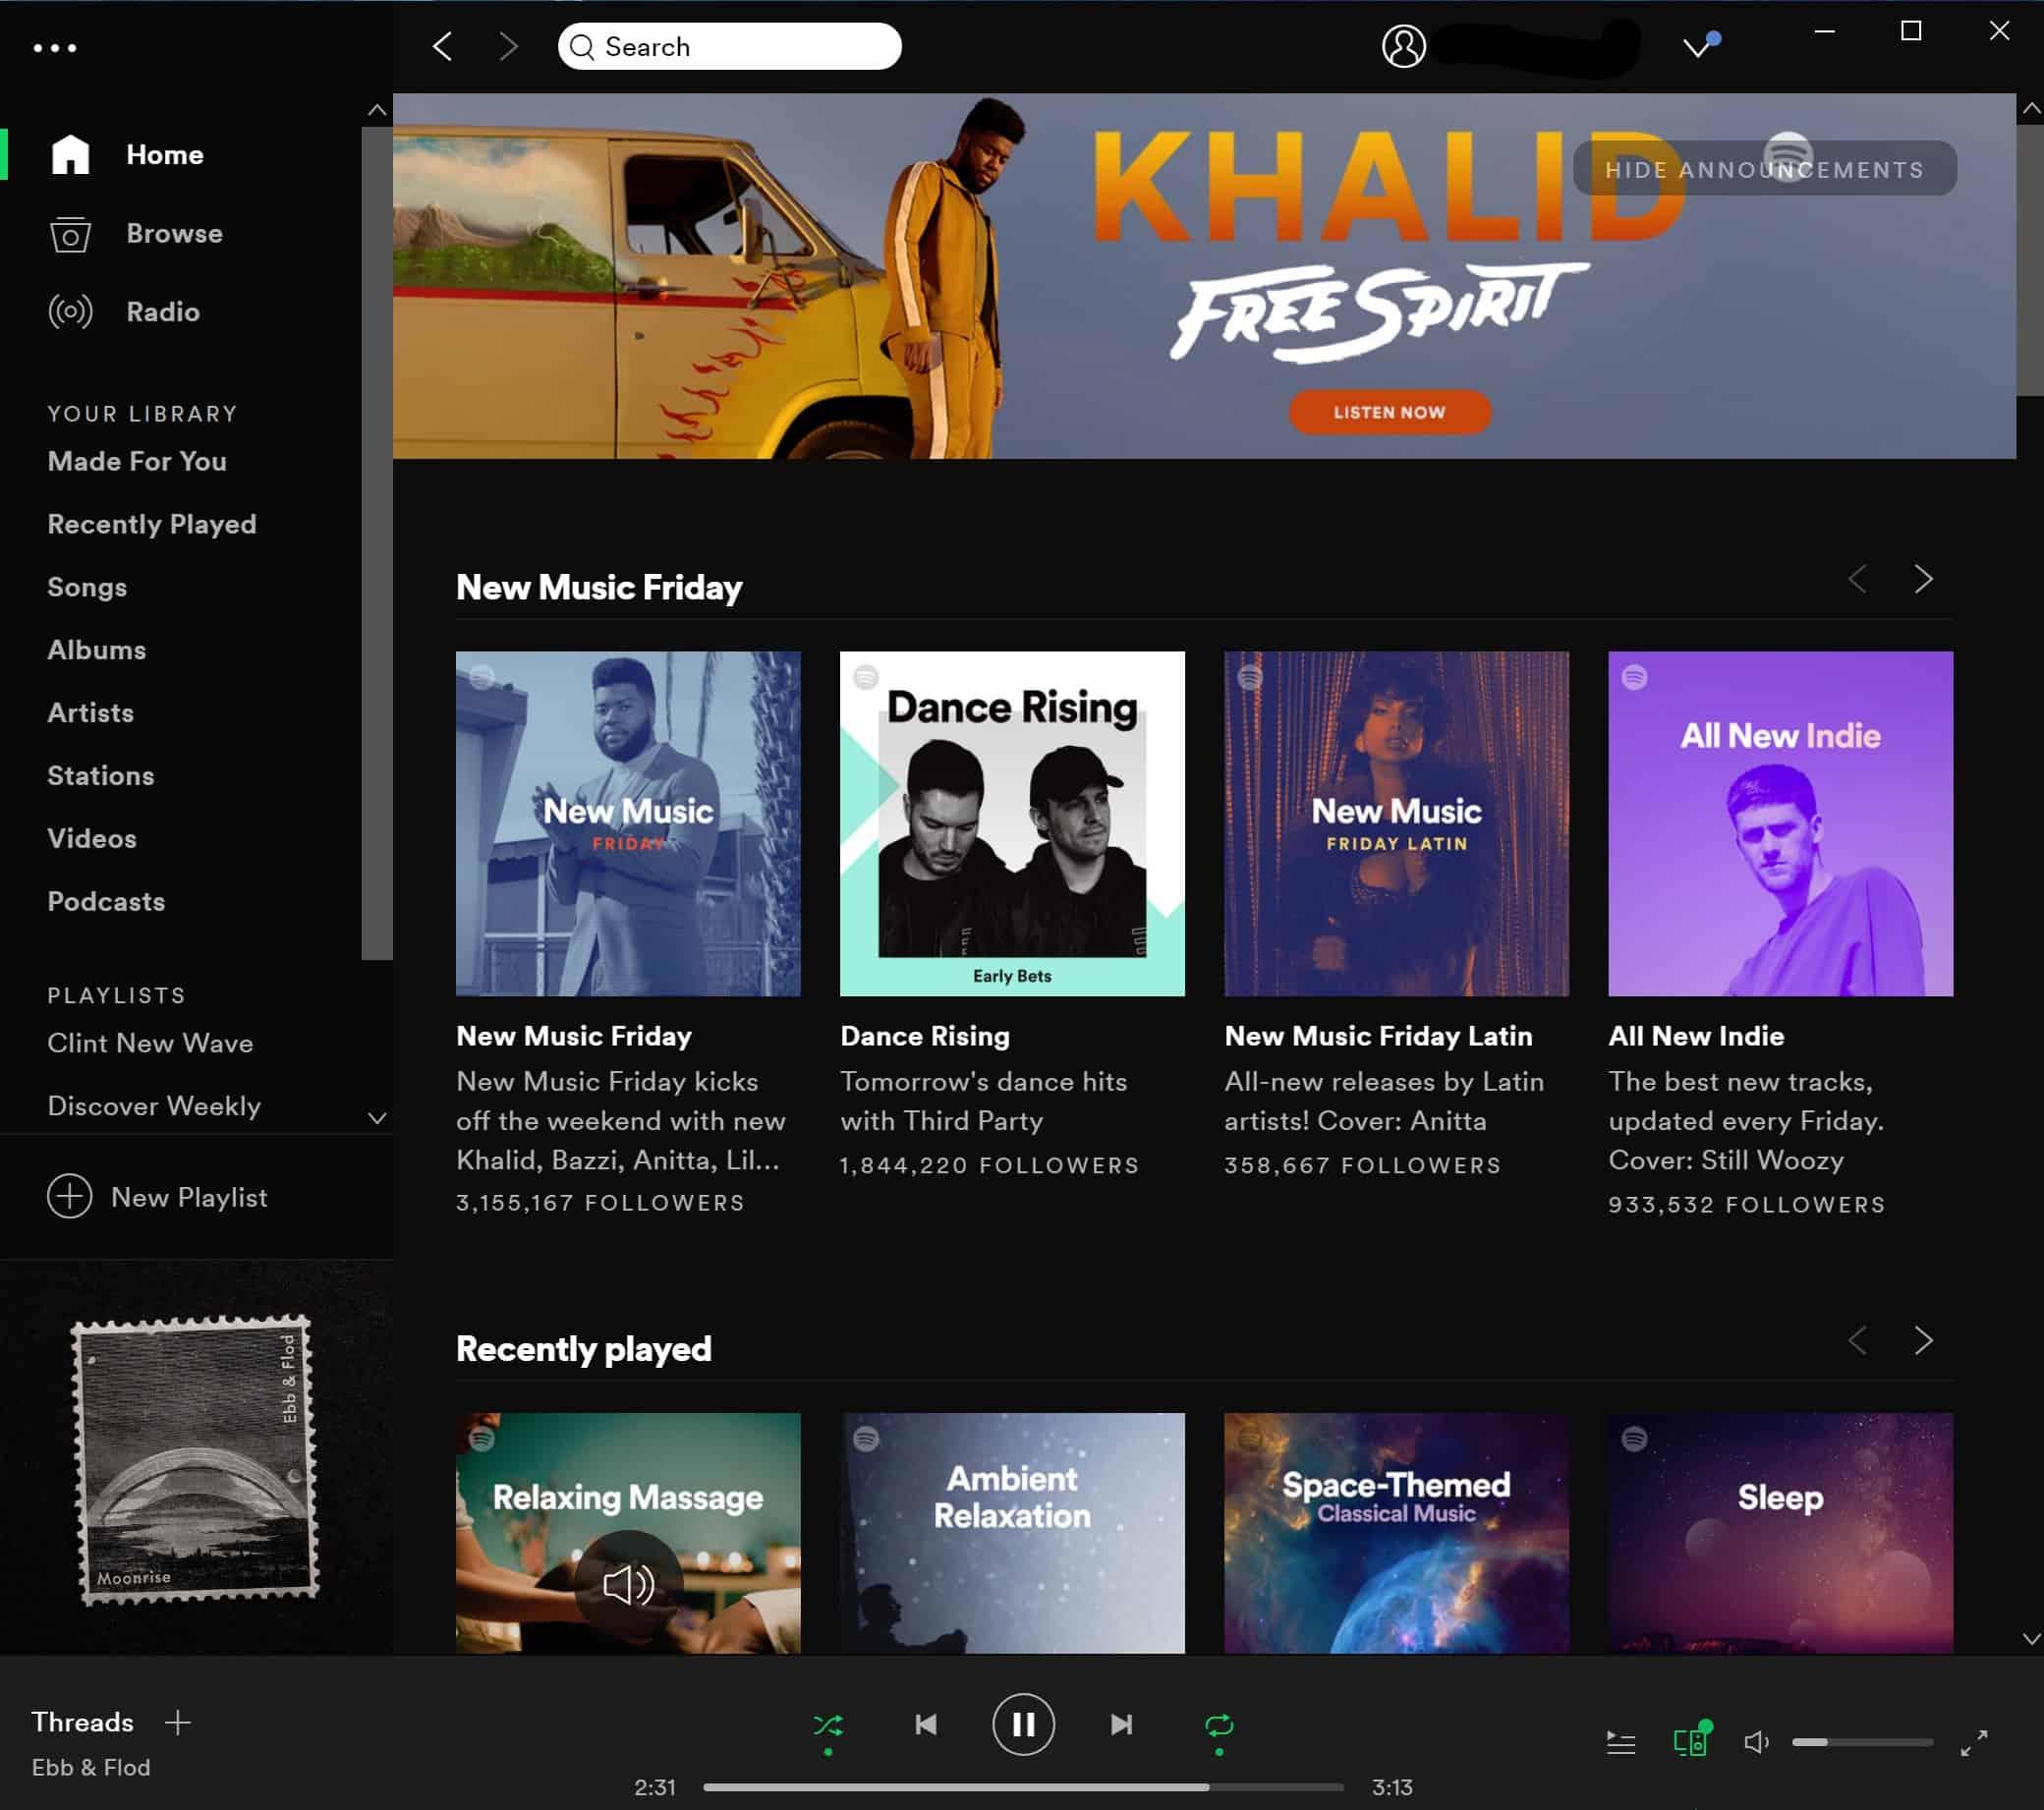 Trendspotting: Apple Music hits 28M users, passes Spotify at 26M